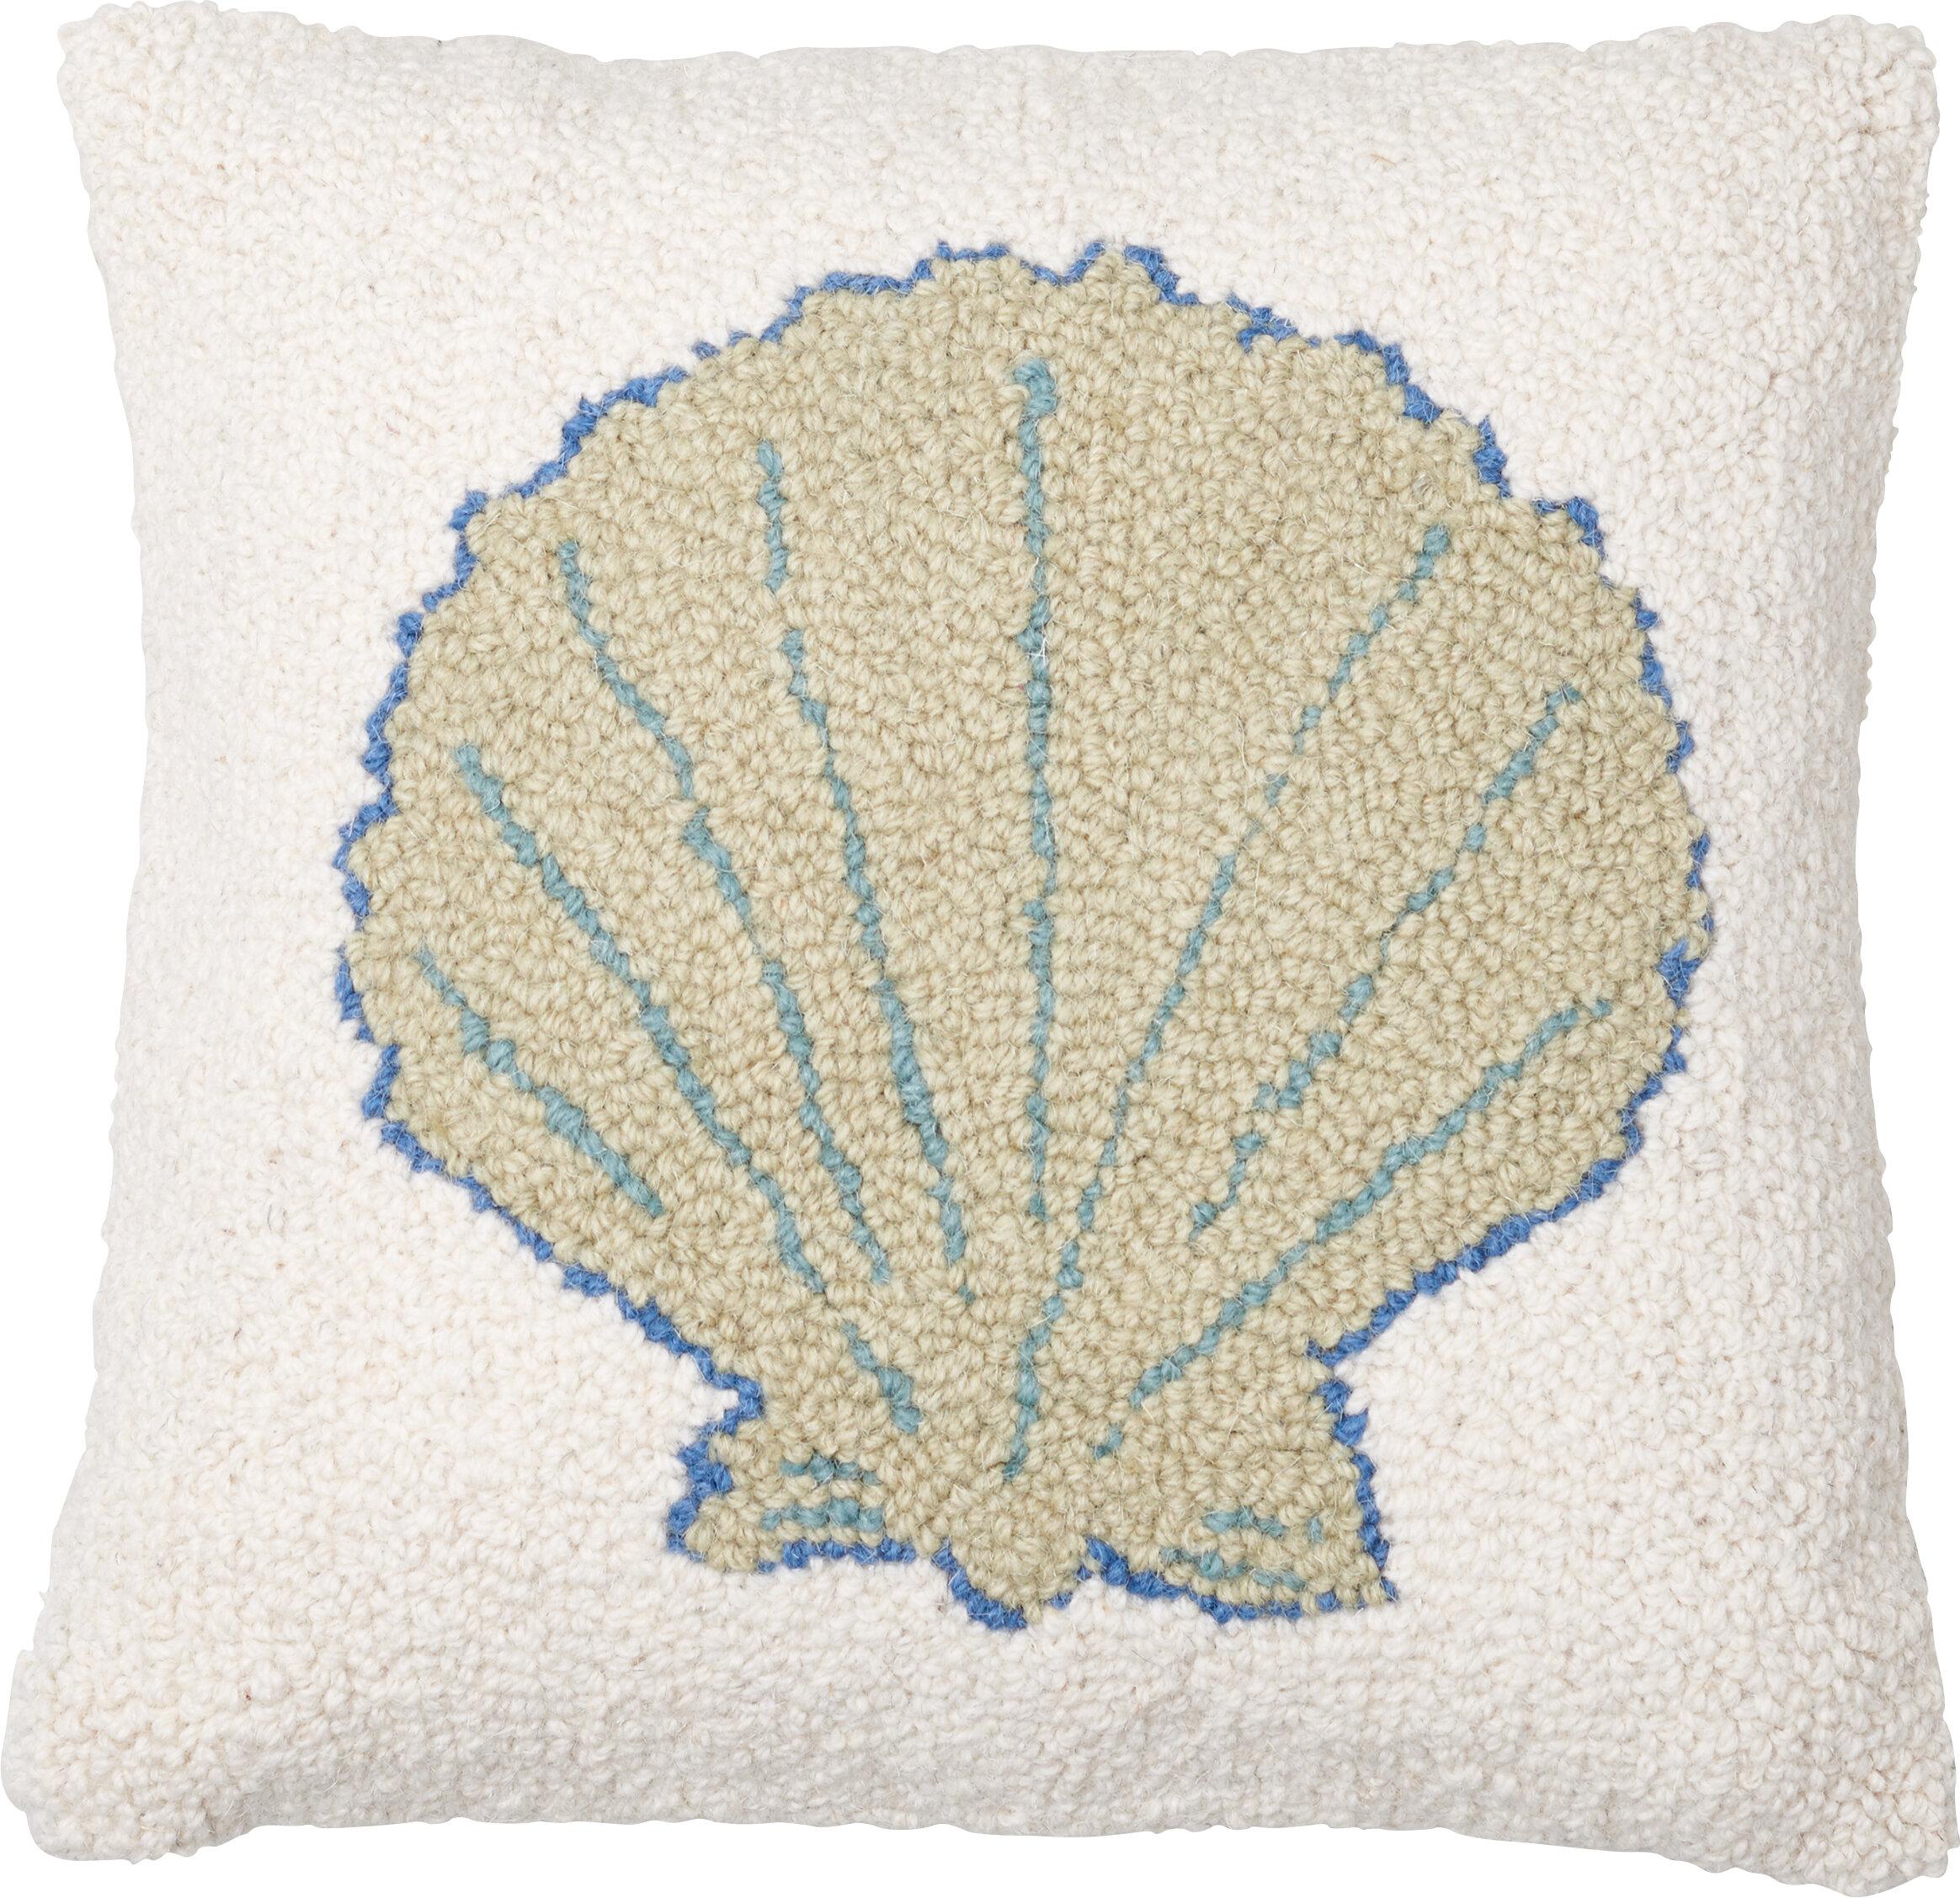 Amity Home Sea Shell Wool Throw Pillow Reviews Wayfair